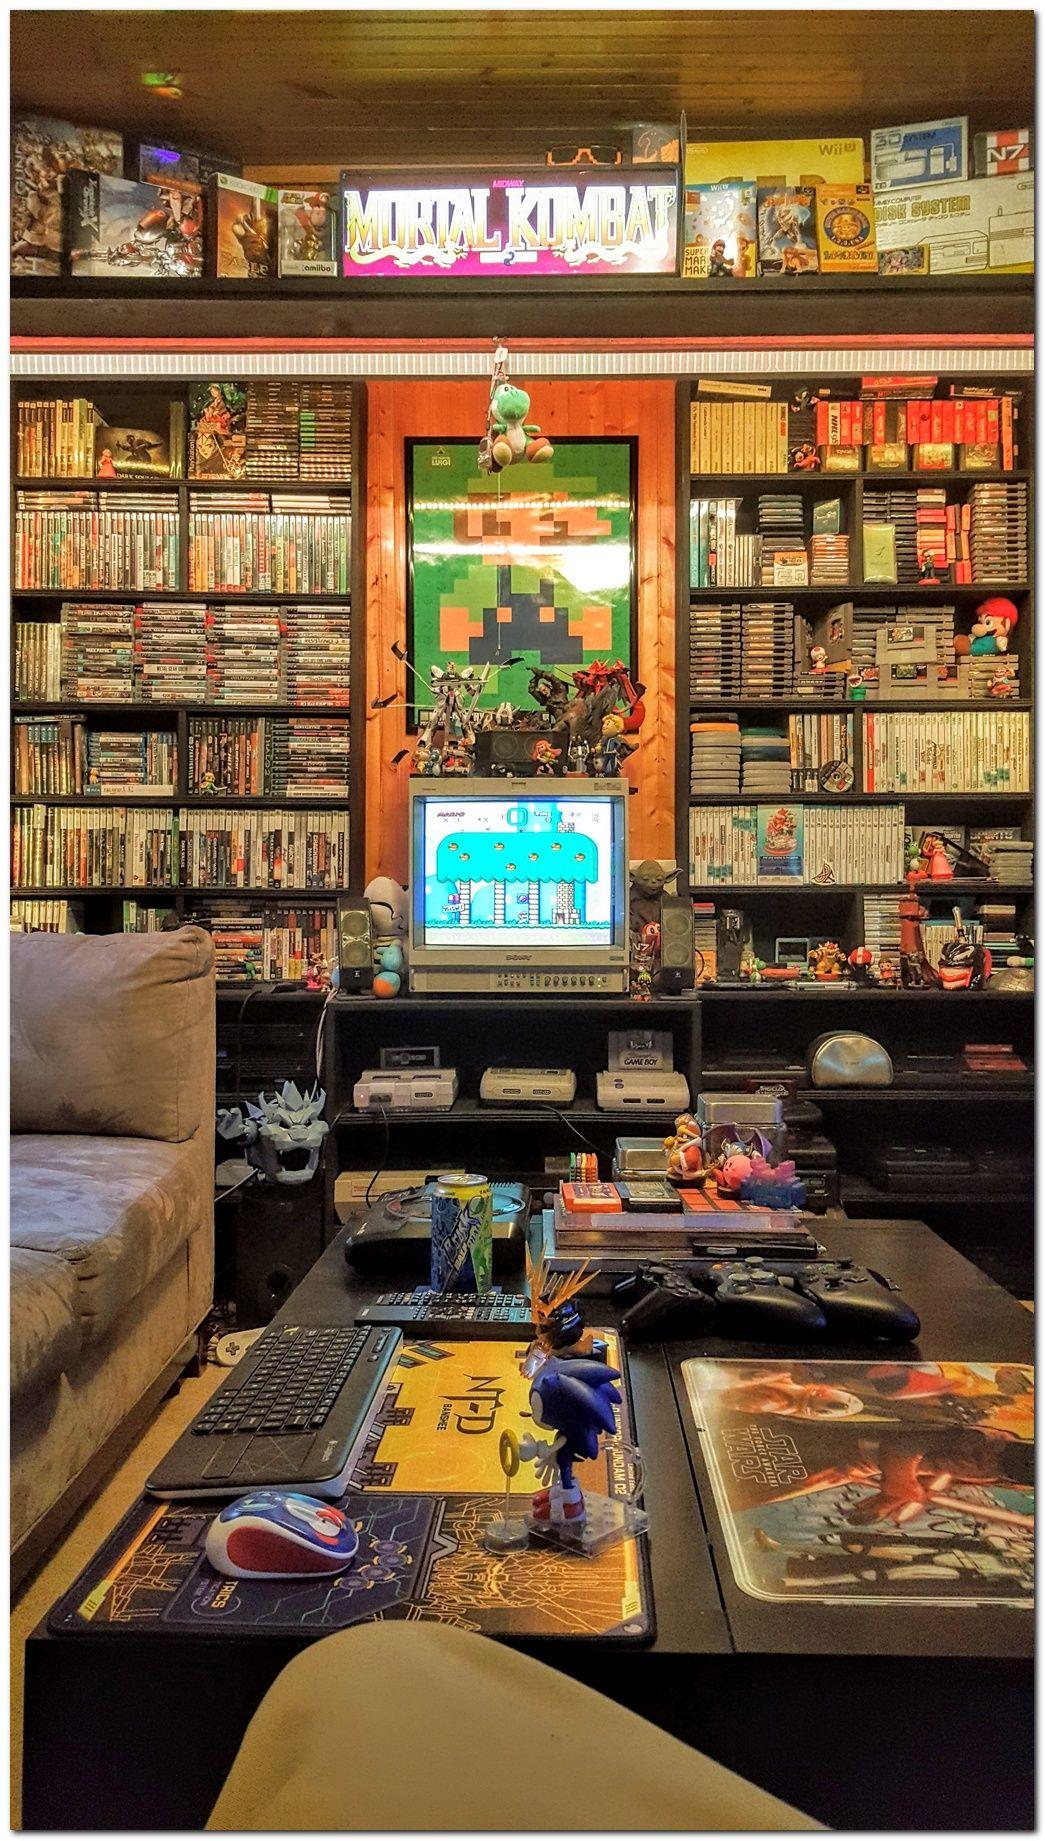 Room Design Online Games: 100+ Cool Interior Design Ideas For Gamers